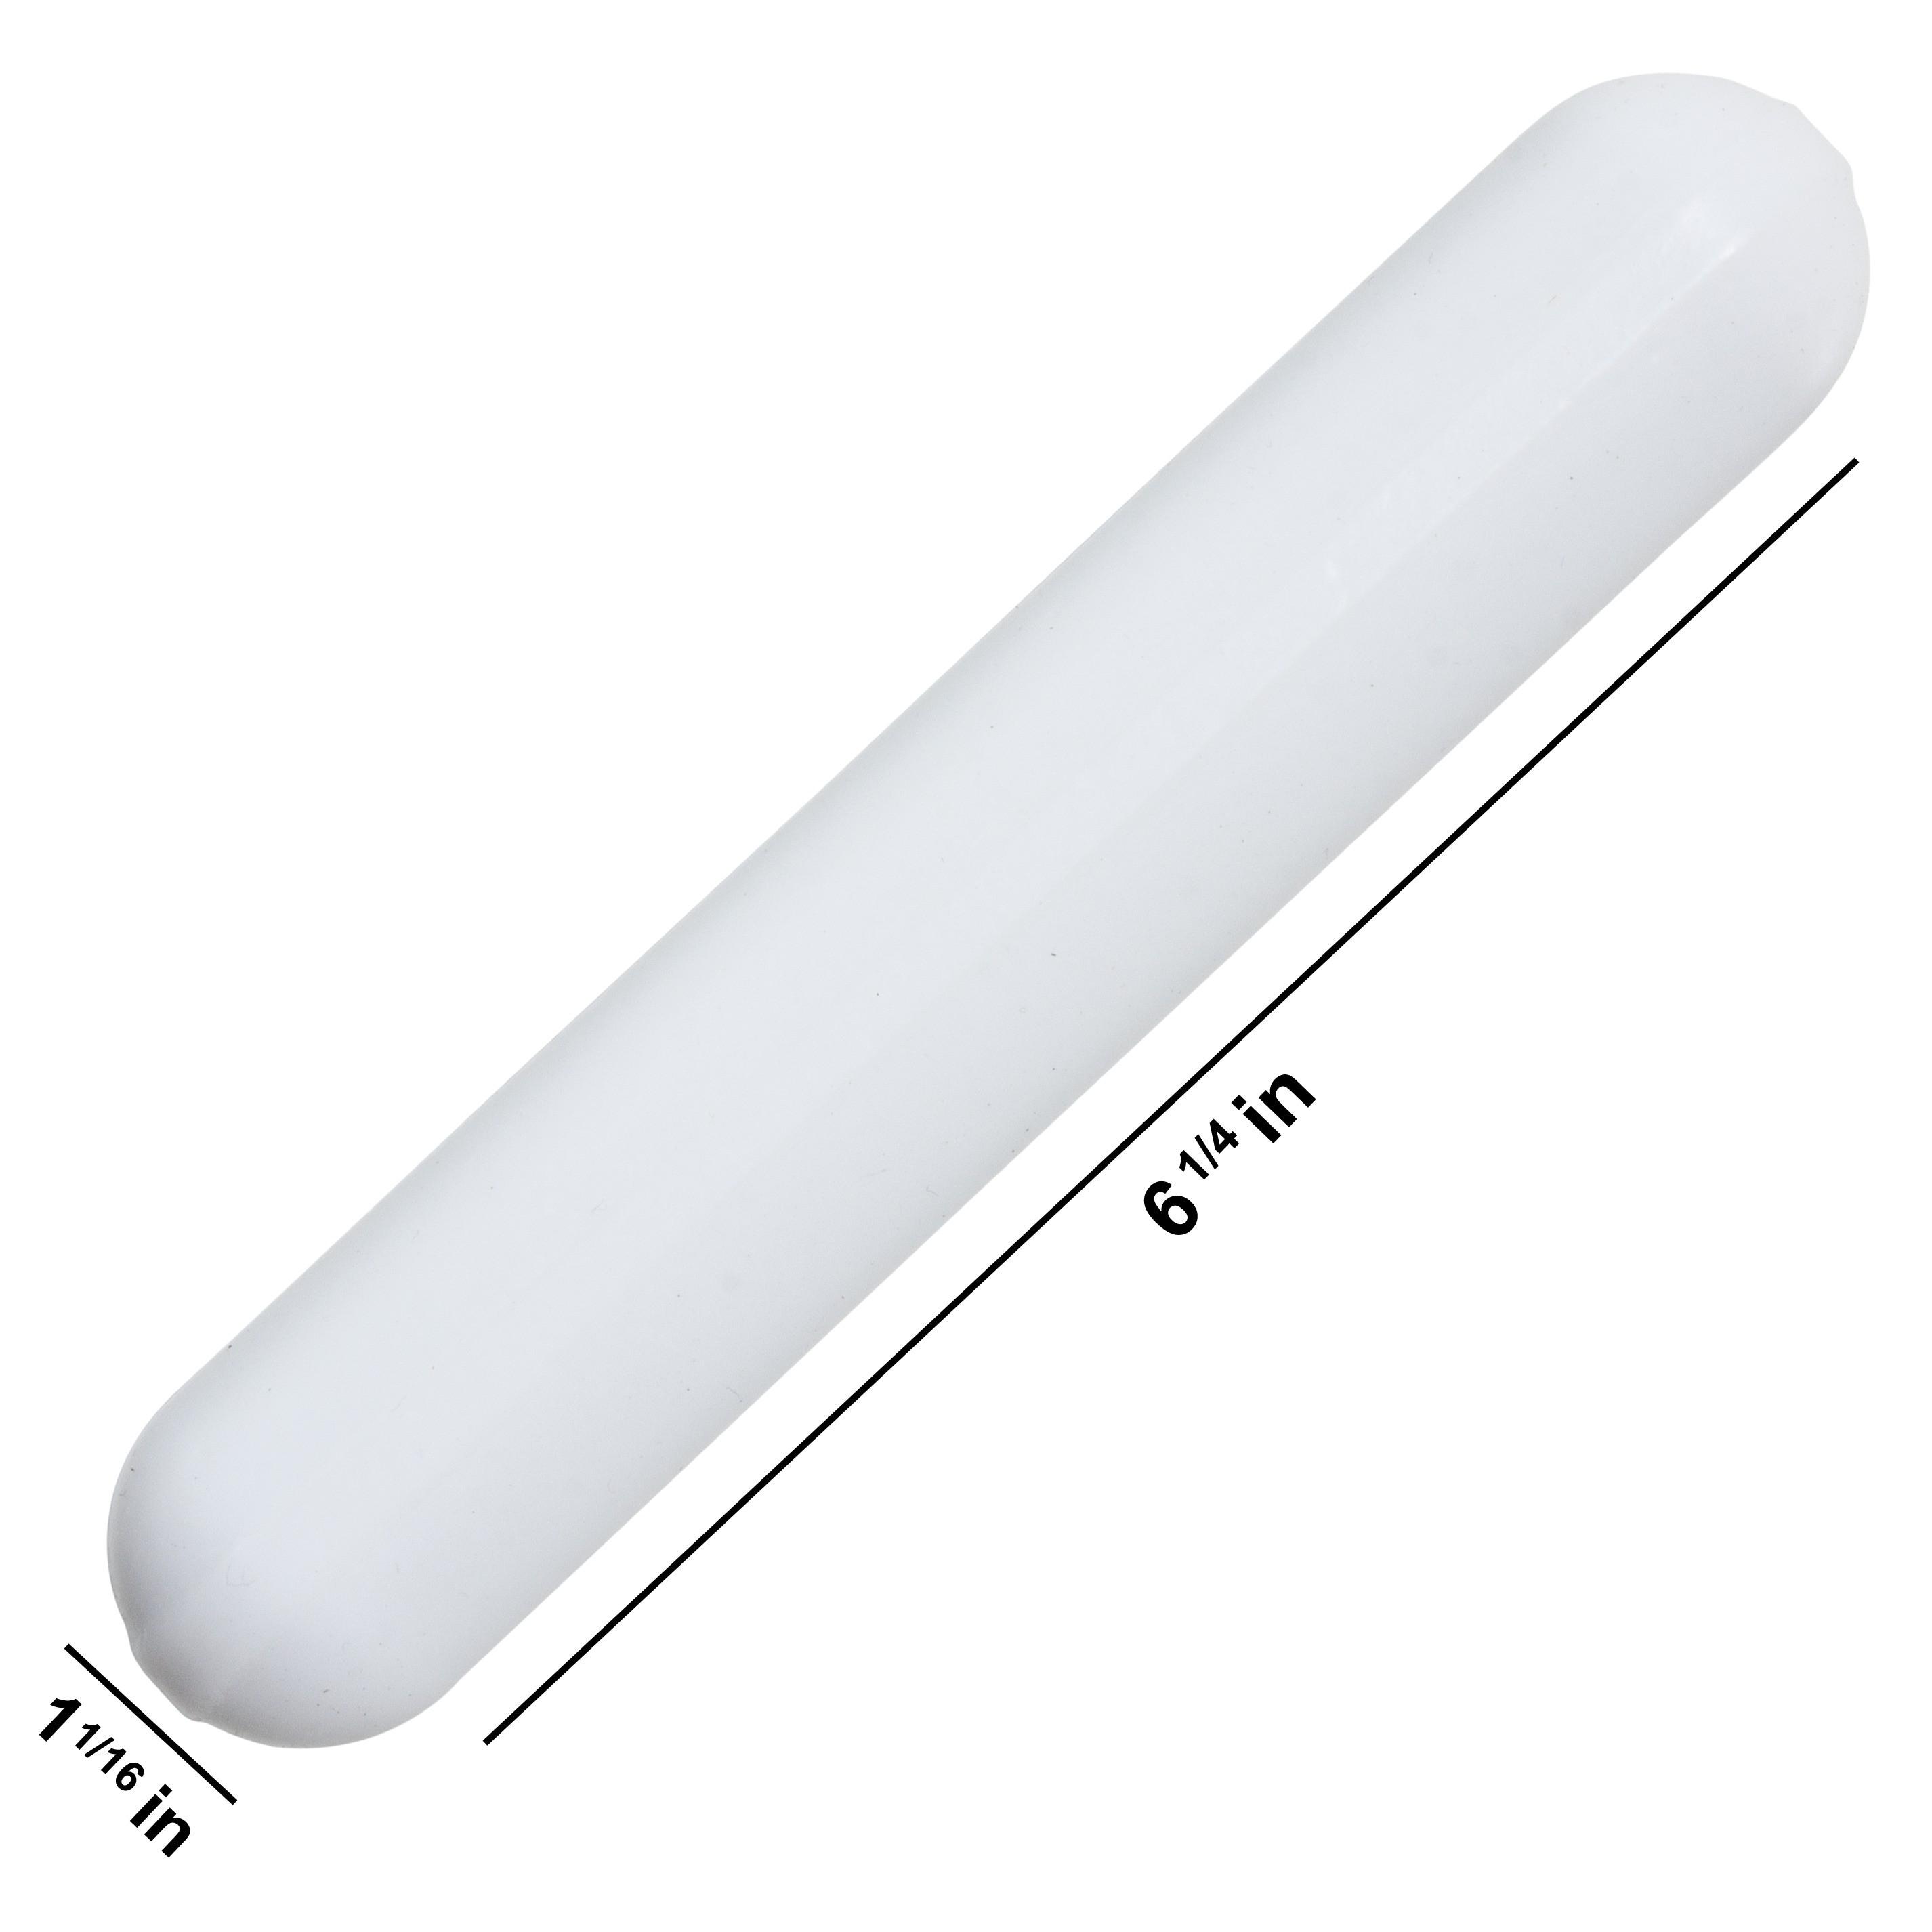 Bel-Art Spinbar Giant Polygon Teflon Magnetic Stirring Bar; 159 x 27mm, White, without Pivot Ring